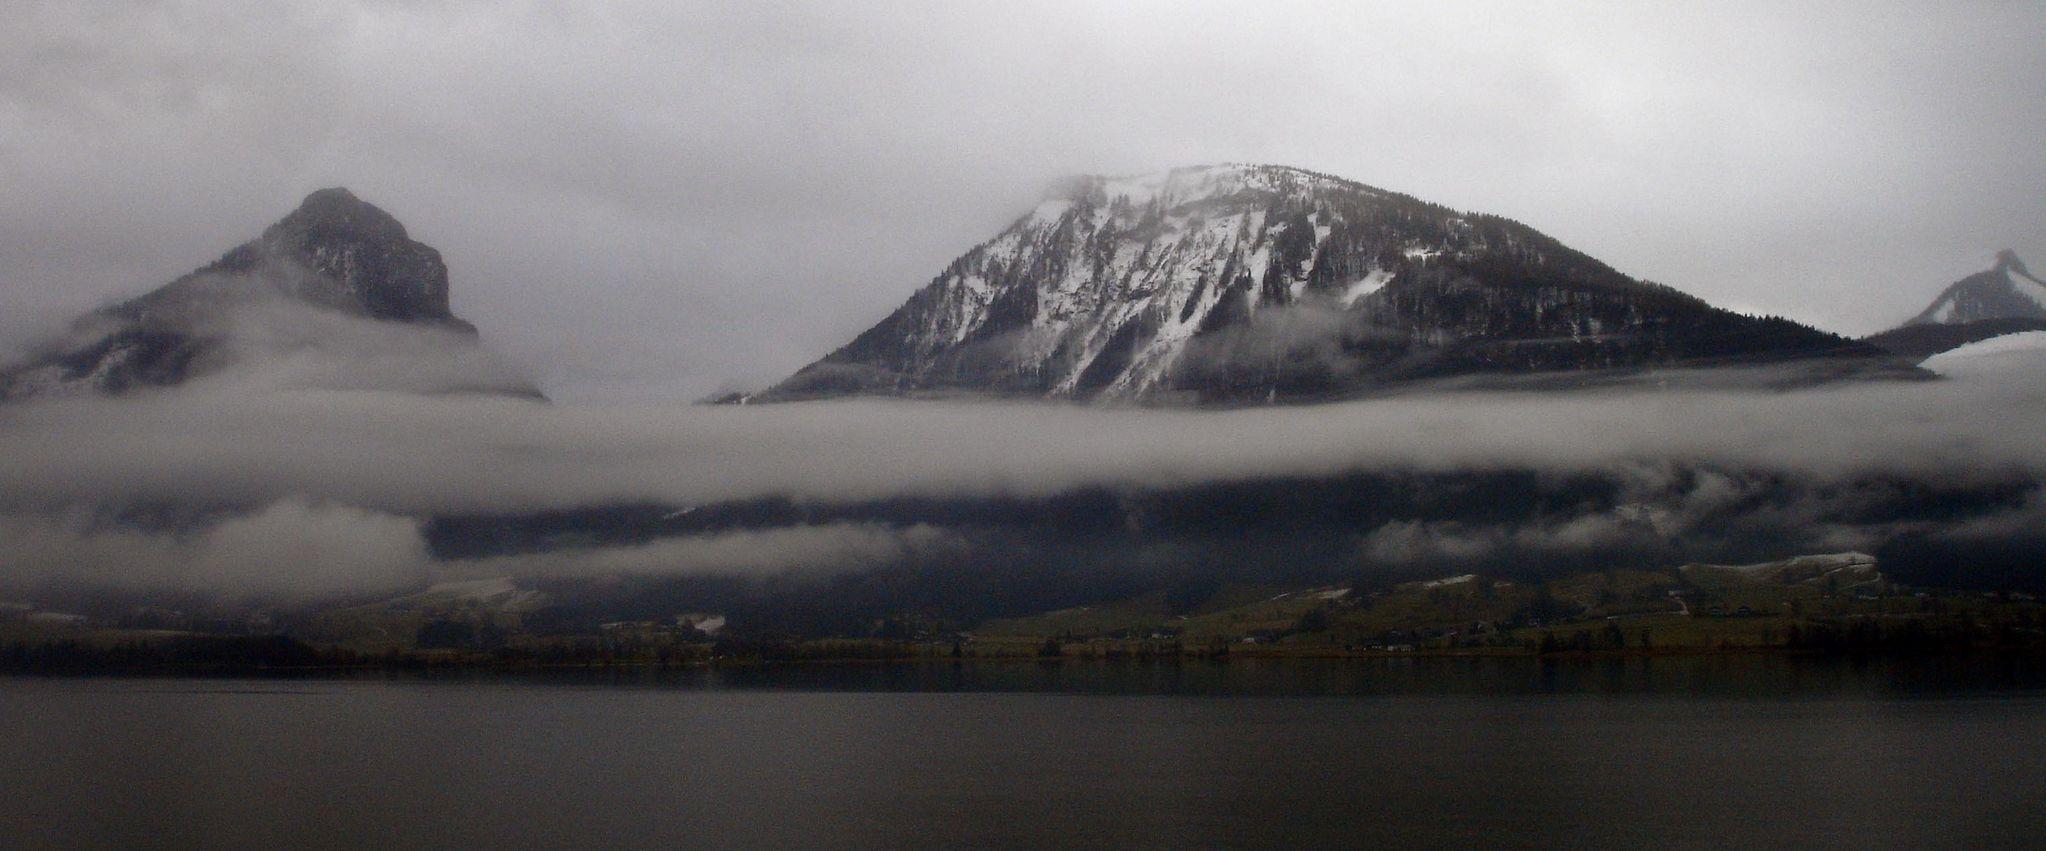 View across Lake Wolfgang, St Wolfgang